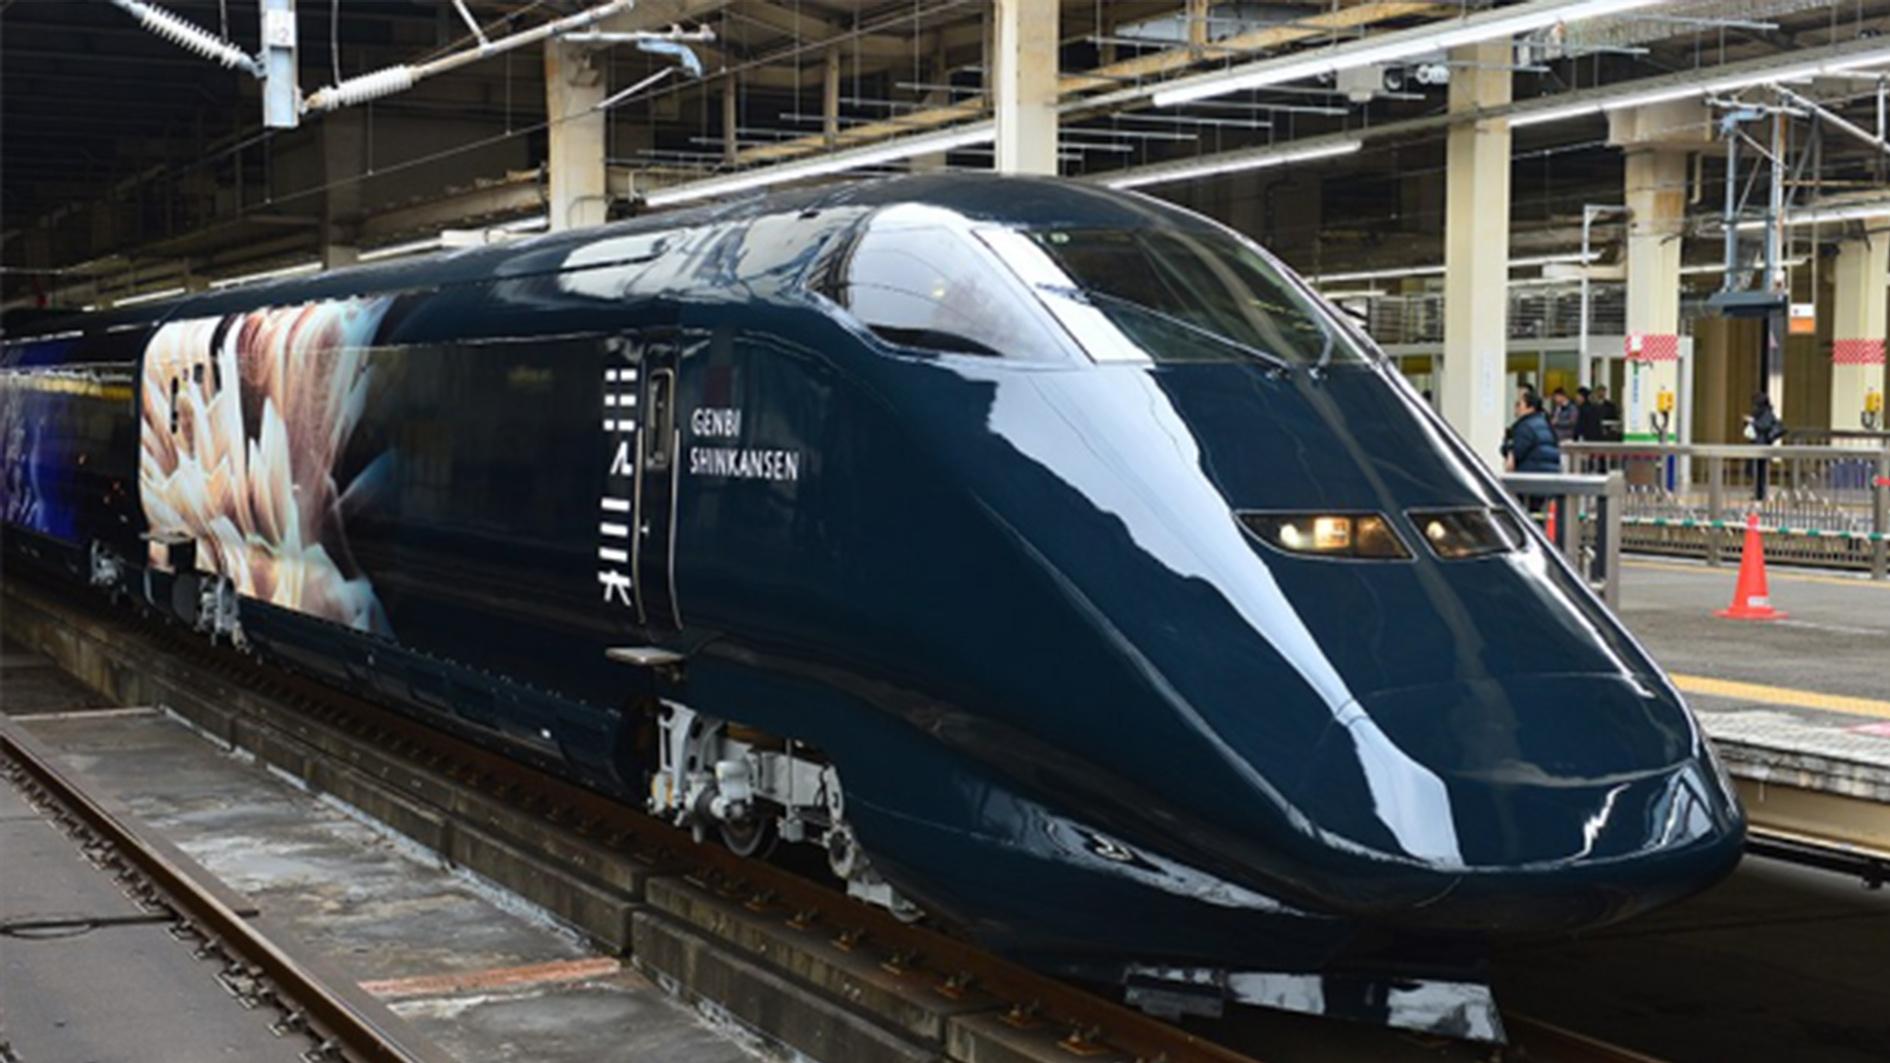 Japanese bullet train world's fastest art gallery - CGTN